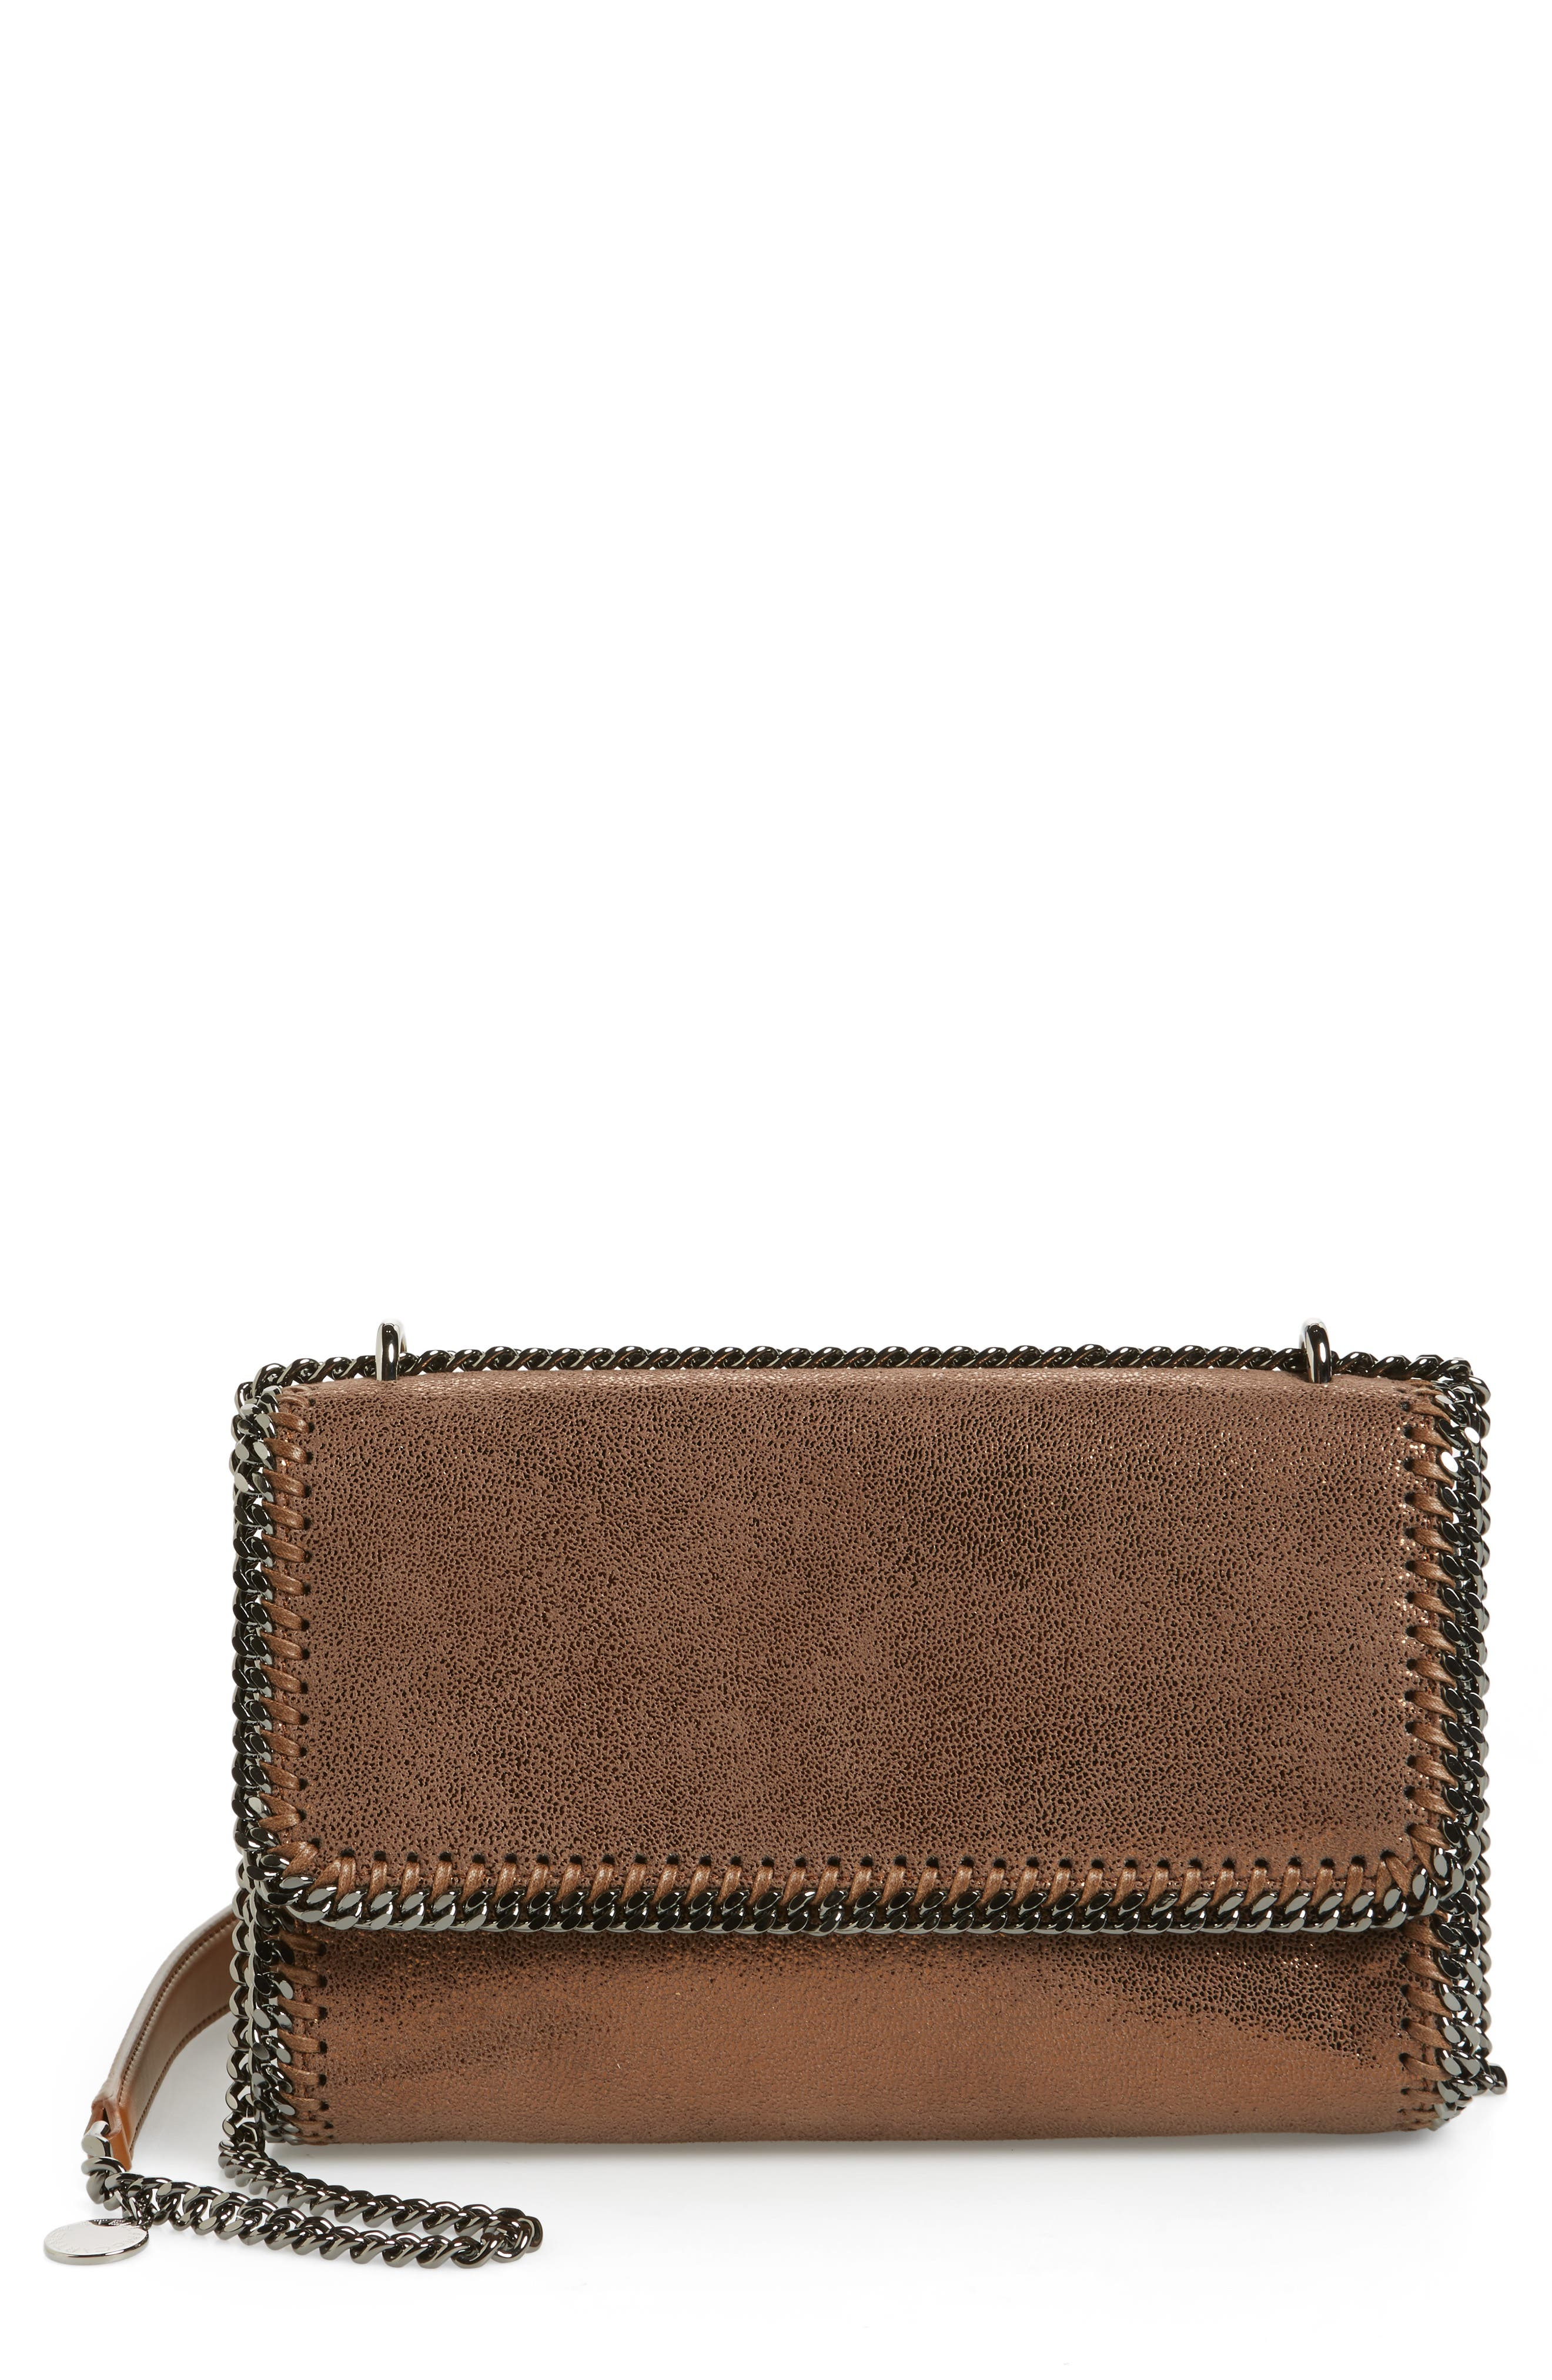 Falabella Metallic Faux Leather Convertible Shoulder Bag,                         Main,                         color, 200